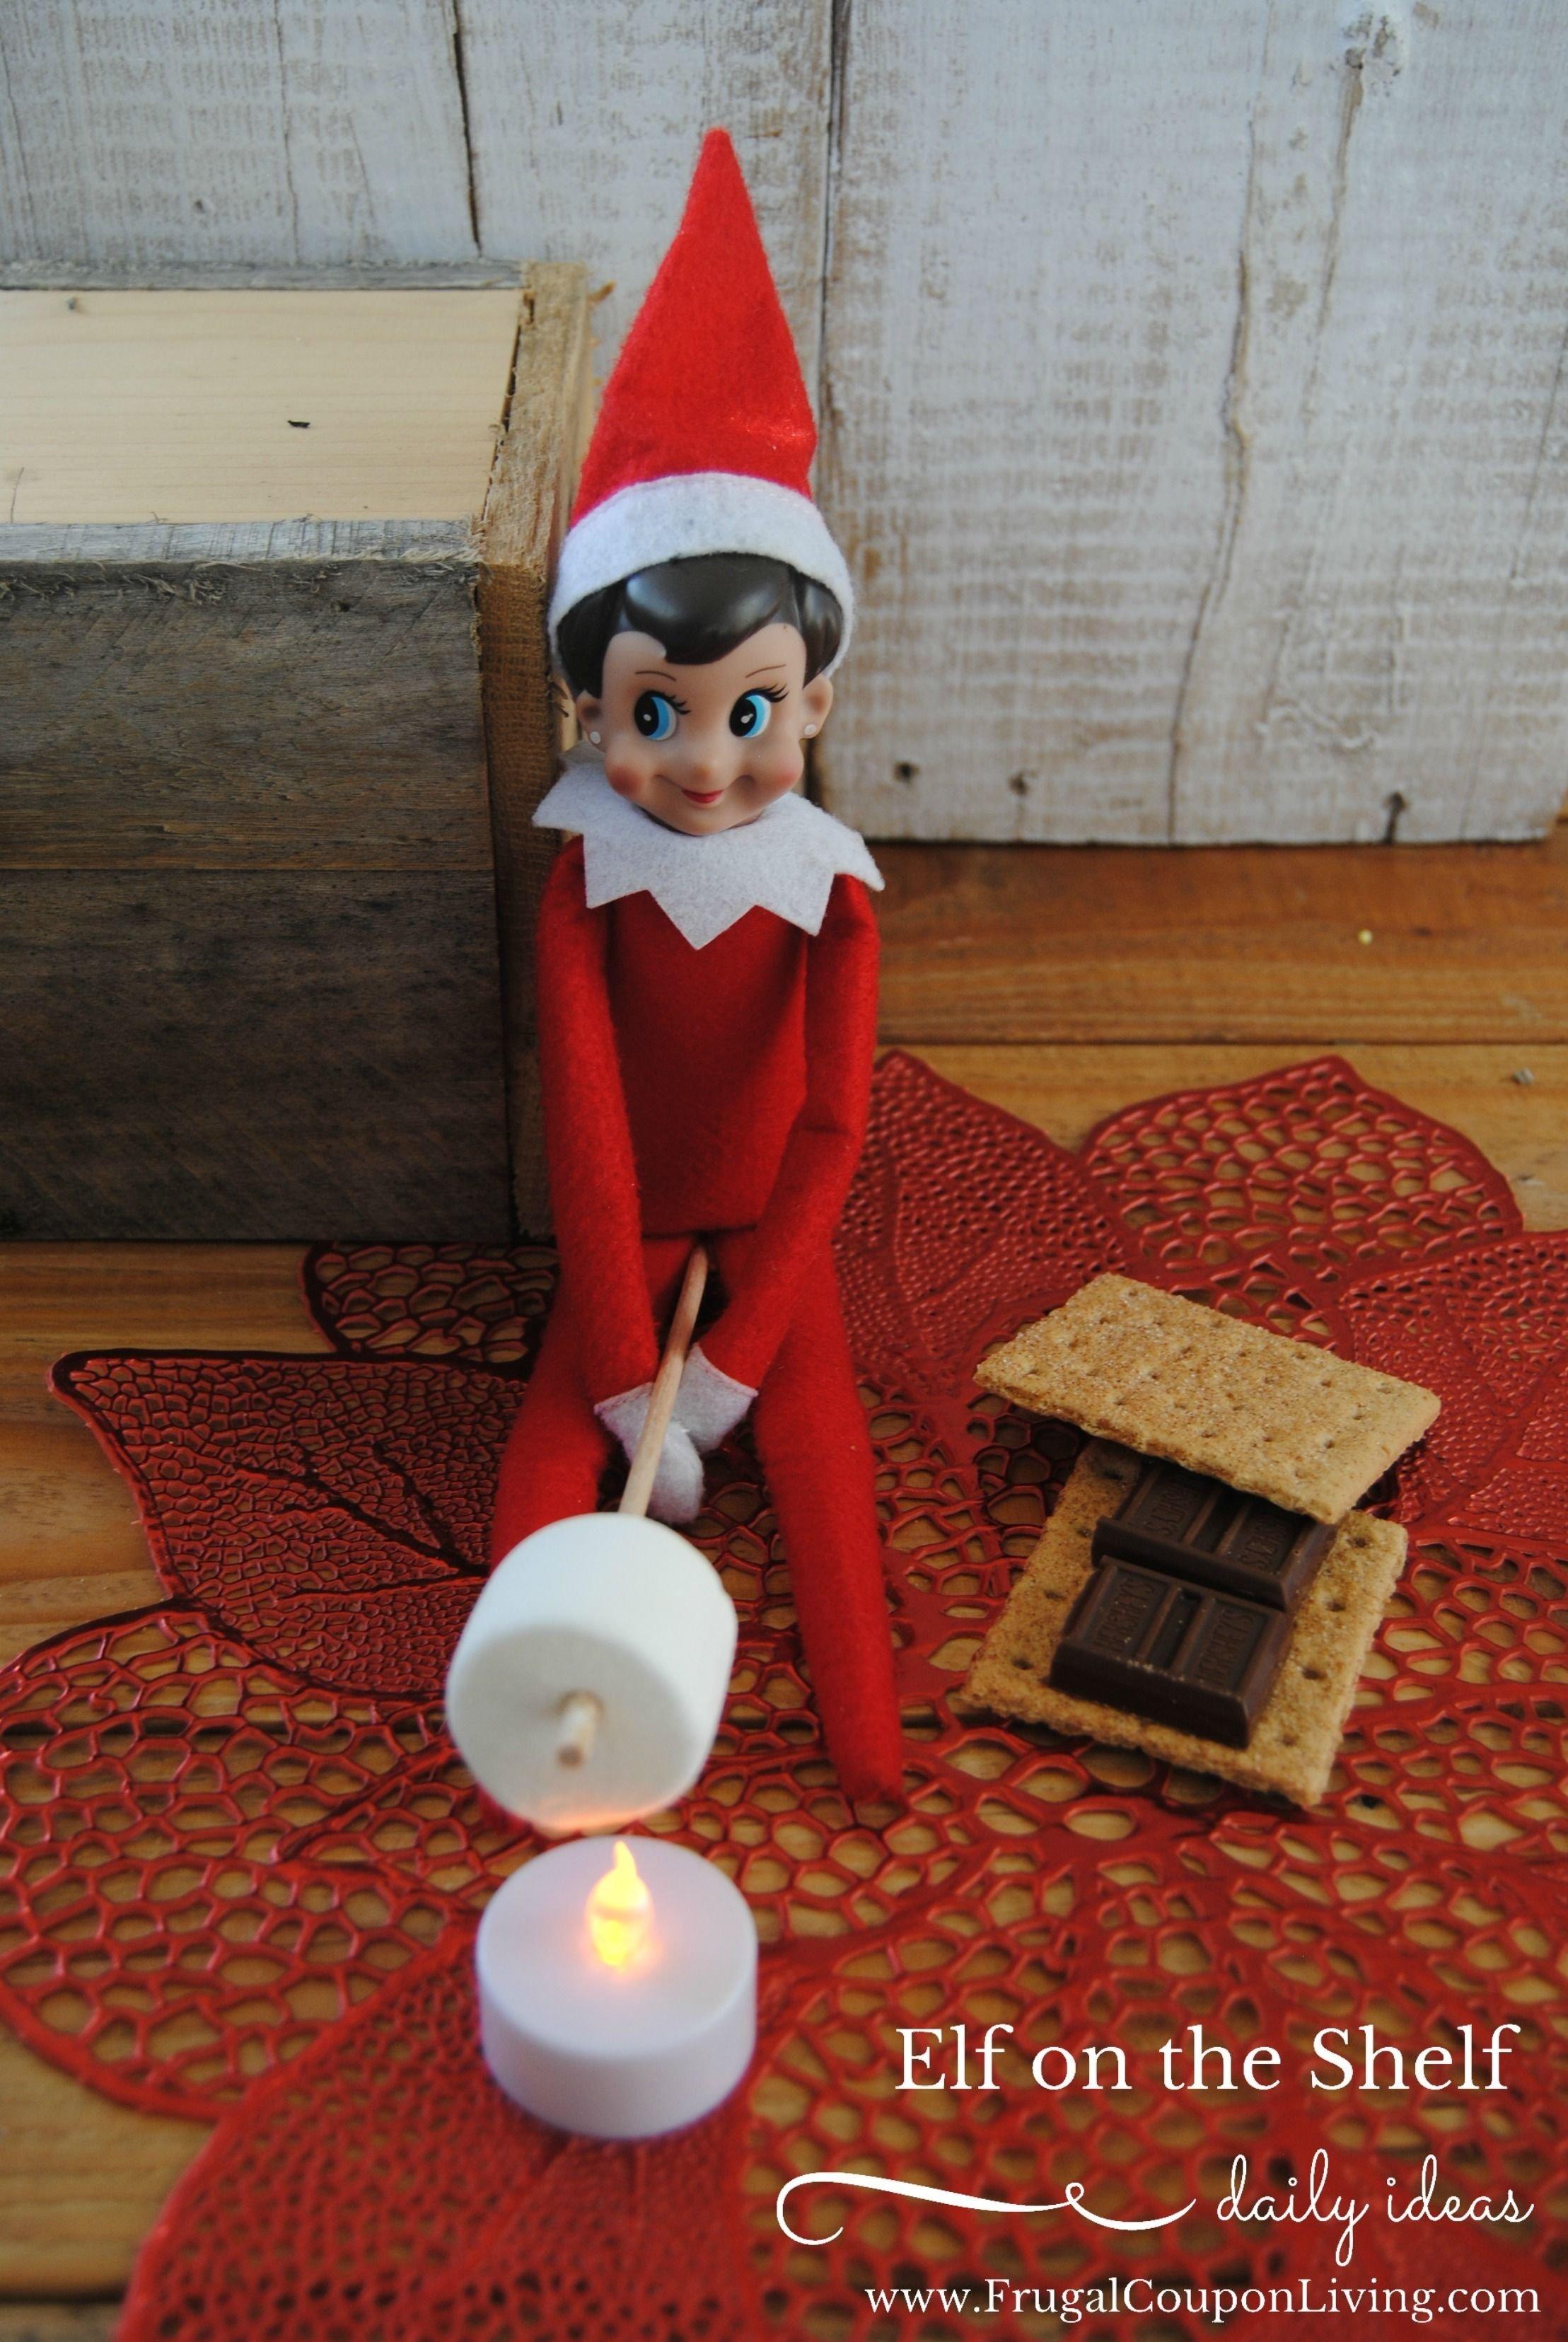 elf on the shelf ideas | shelf ideas, flameless candles and elves